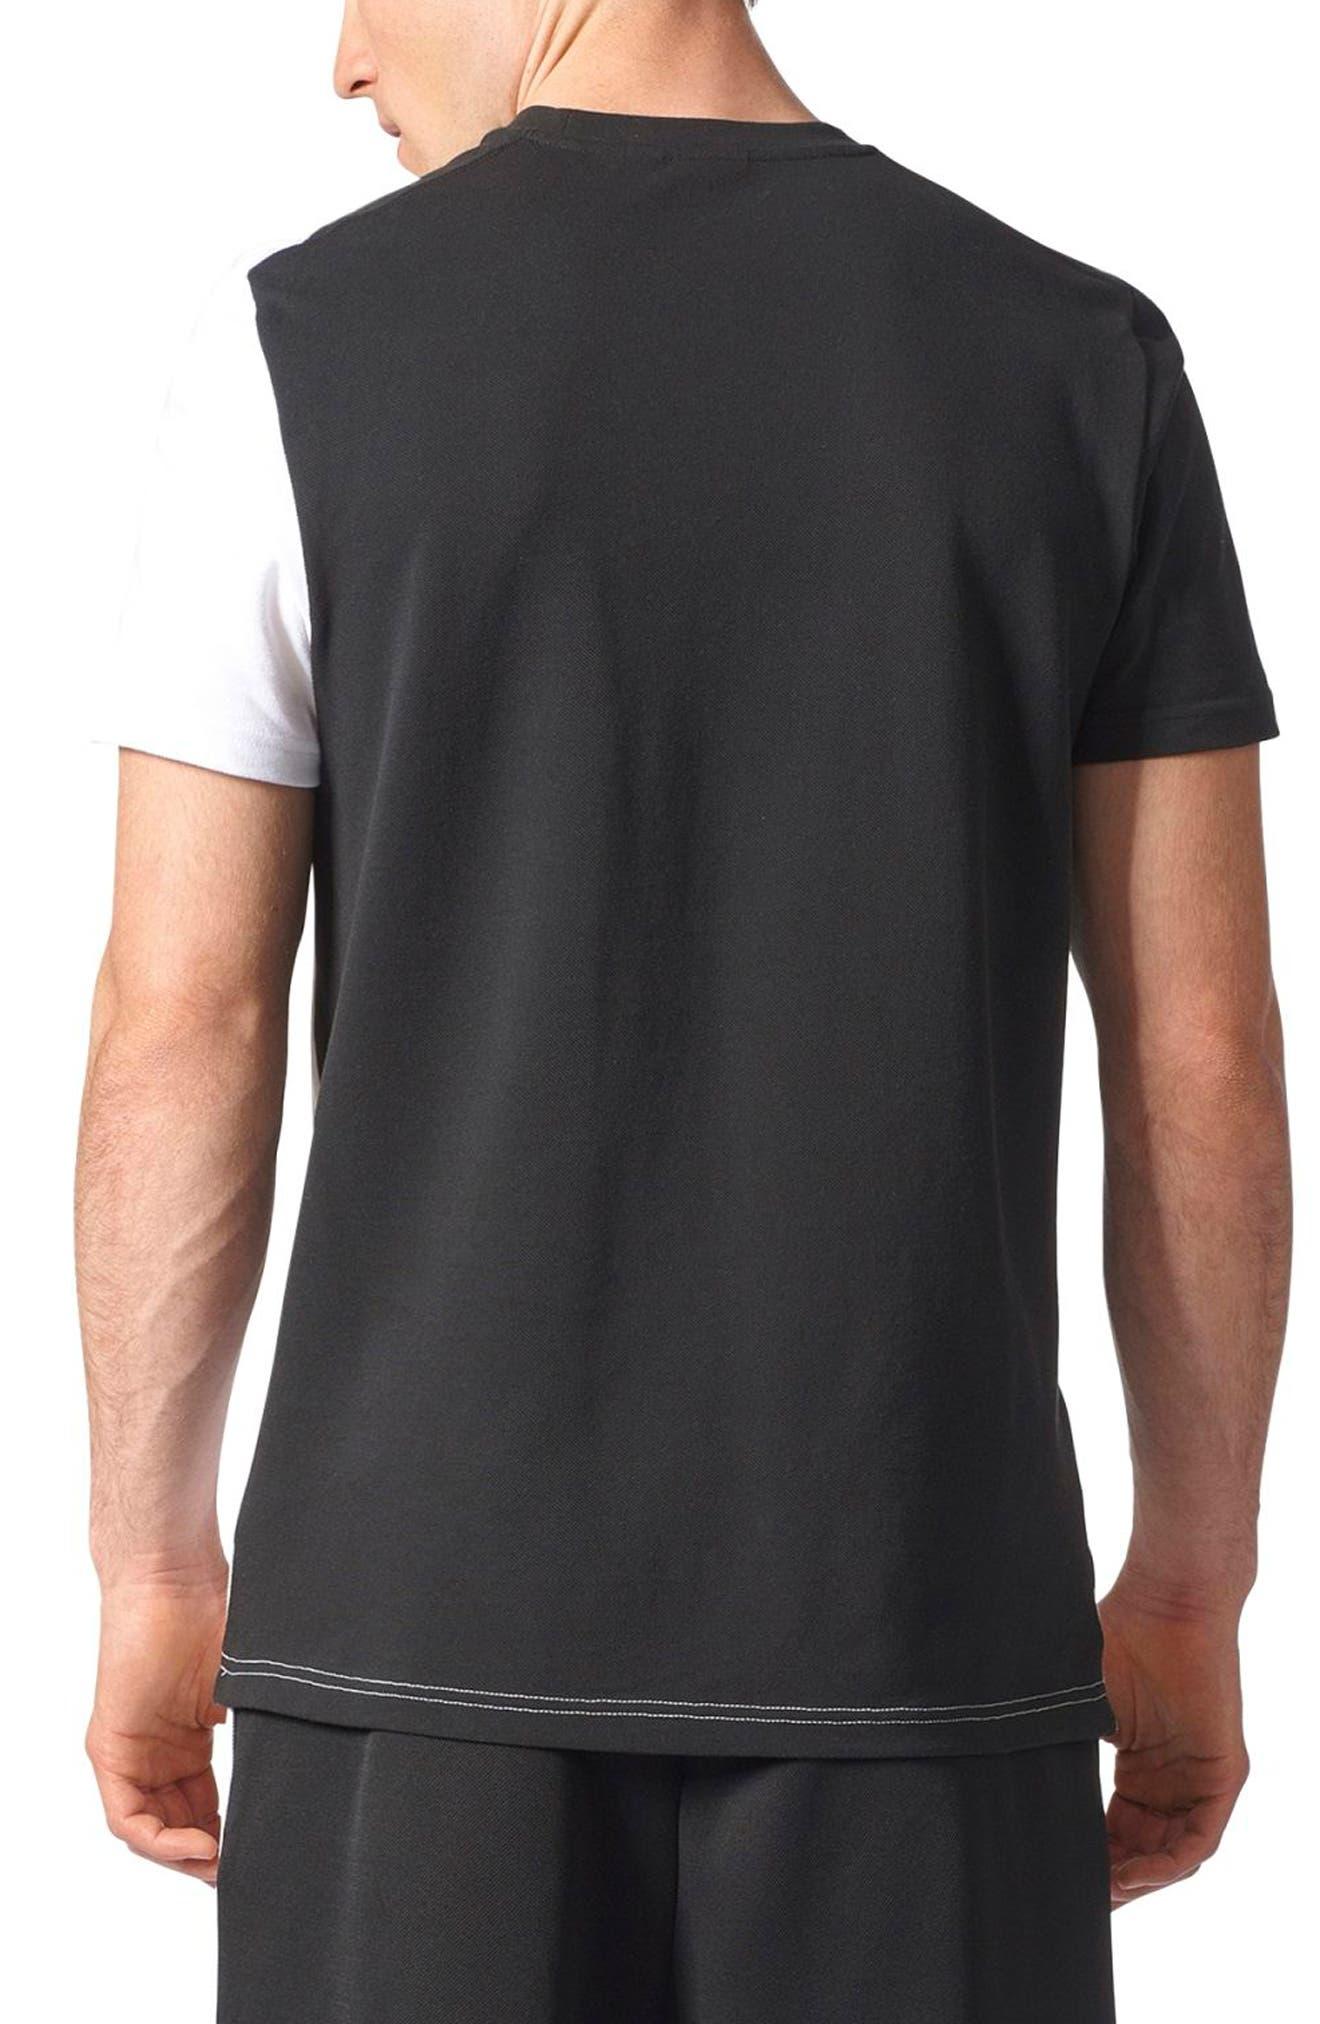 Equipment Rose City T-Shirt,                             Alternate thumbnail 2, color,                             001